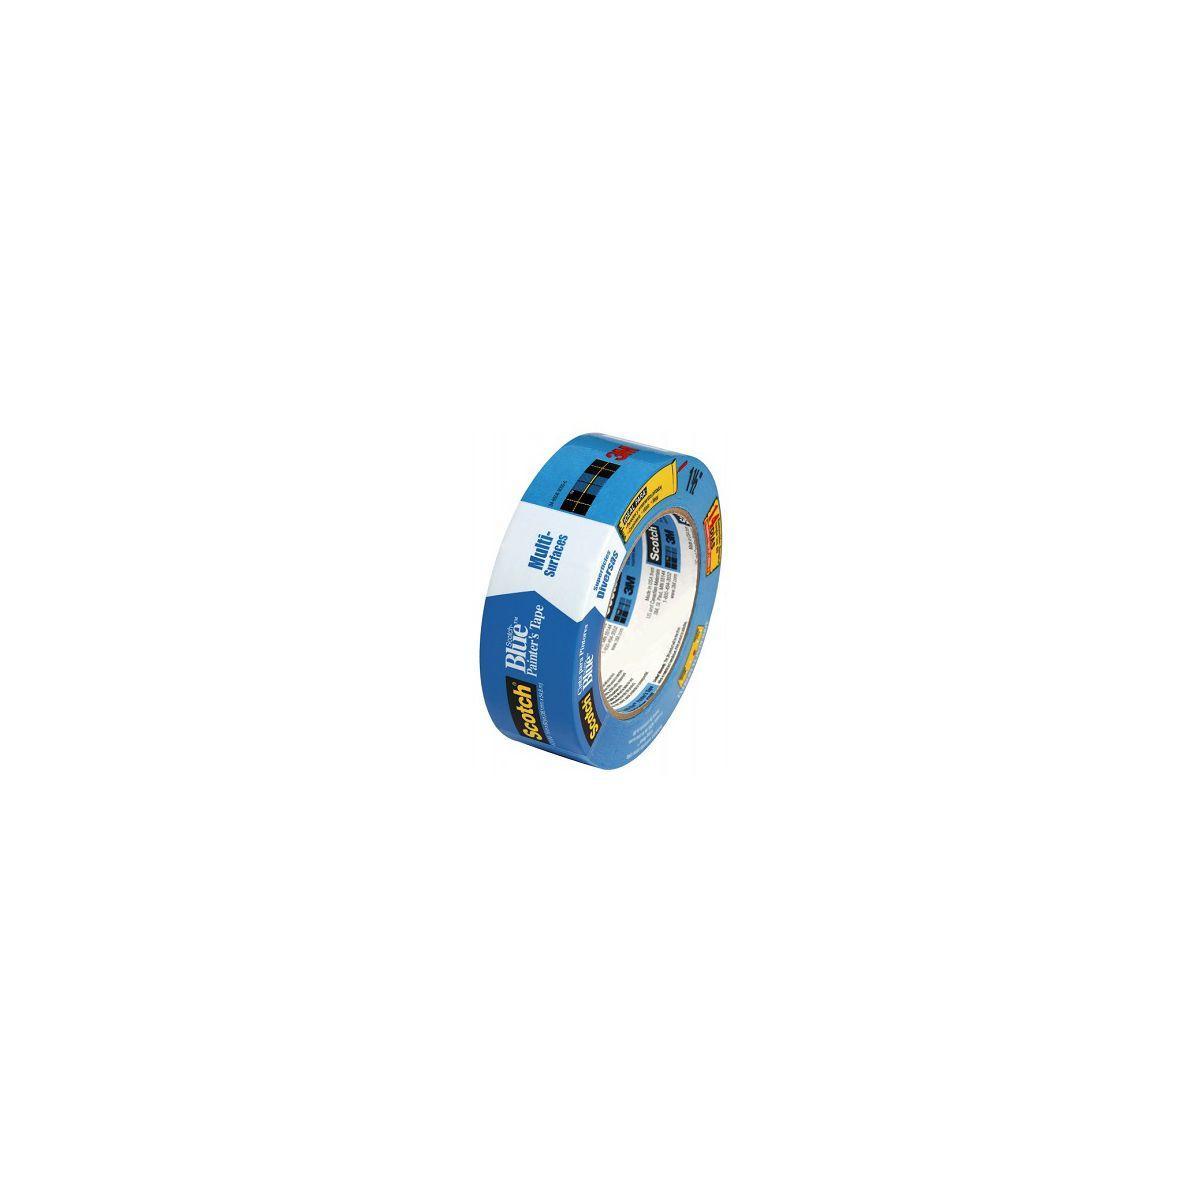 Accessoire imprimante 3d dagoma scotch bleutape 2090 - 2% de r...